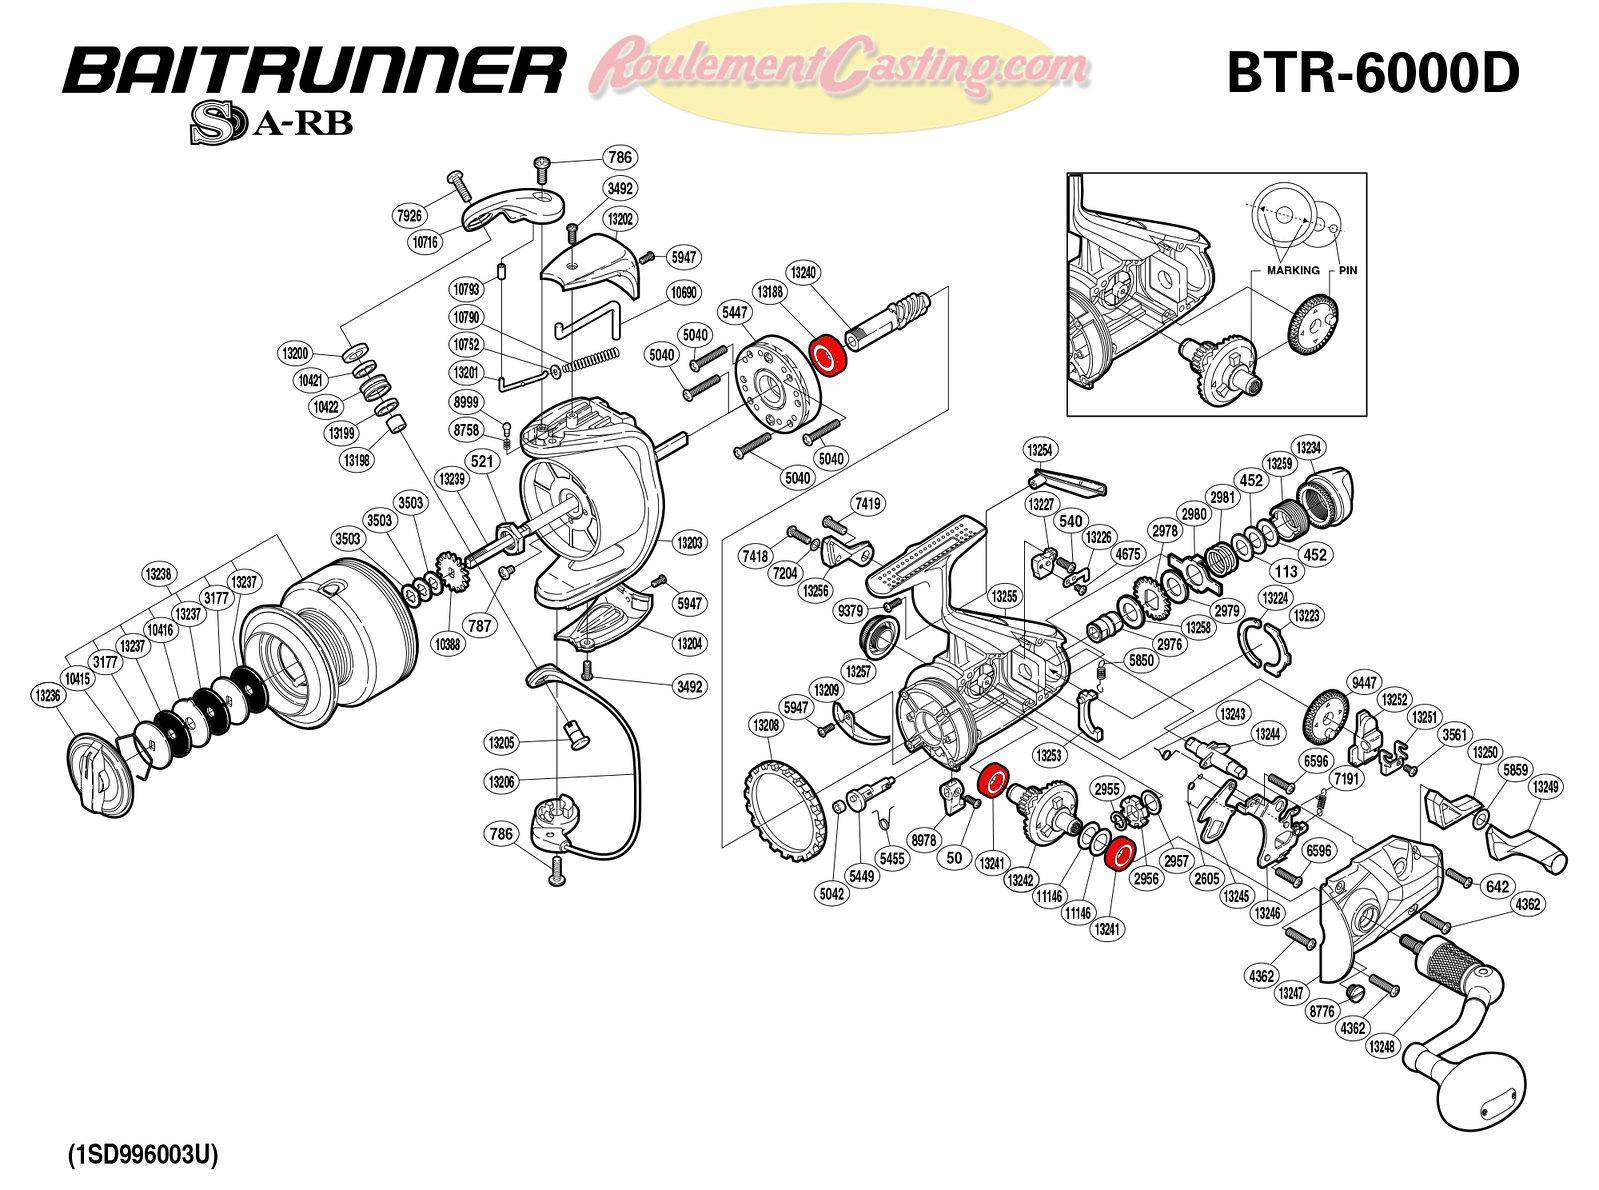 Schema-Shimano-BAITRUNNER-6000D.